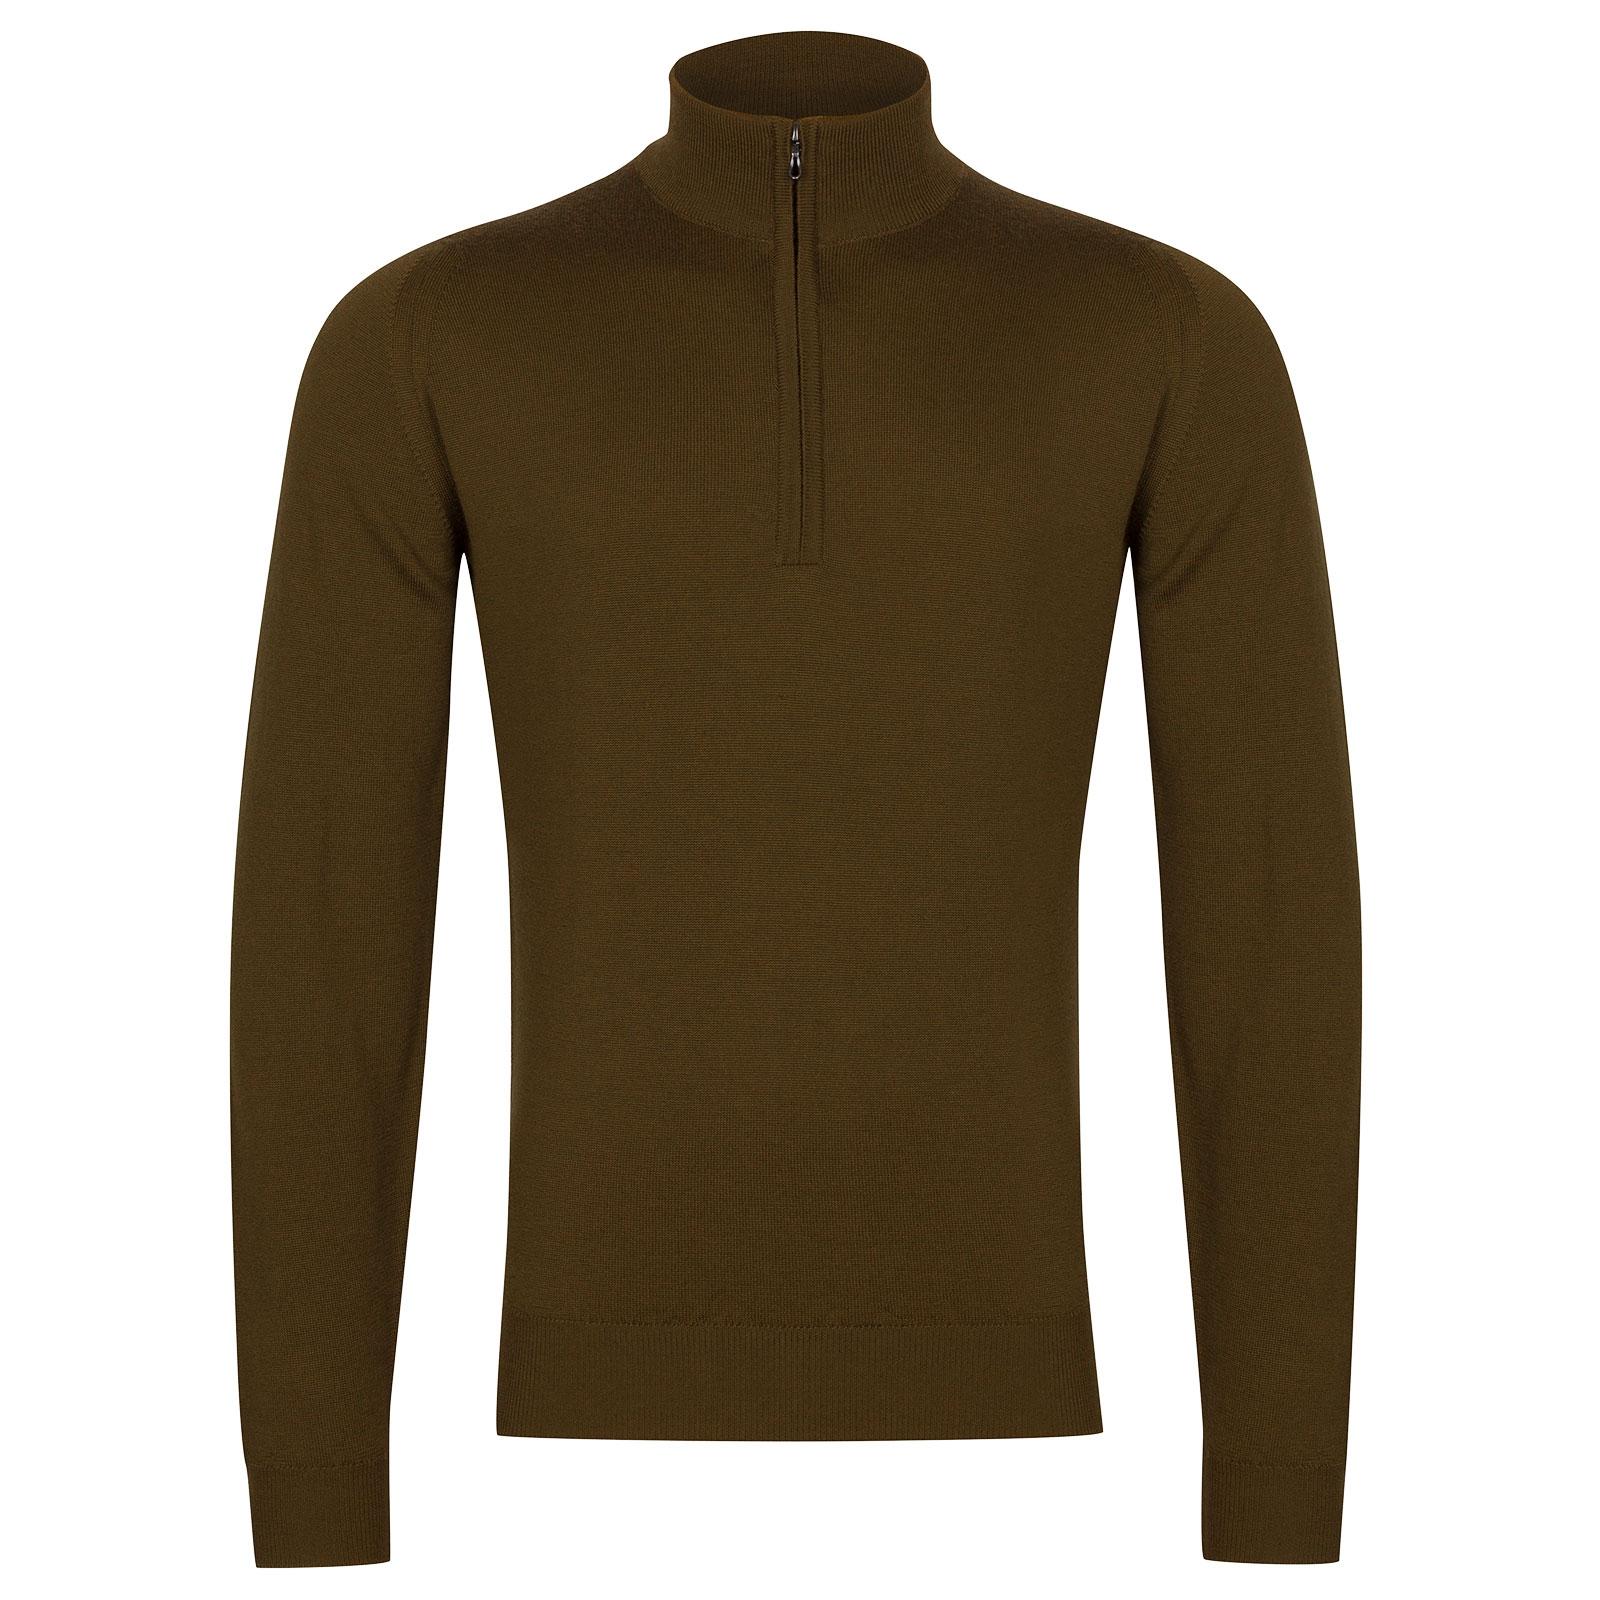 John Smedley Tapton Merino Wool Pullover in Khaki-S